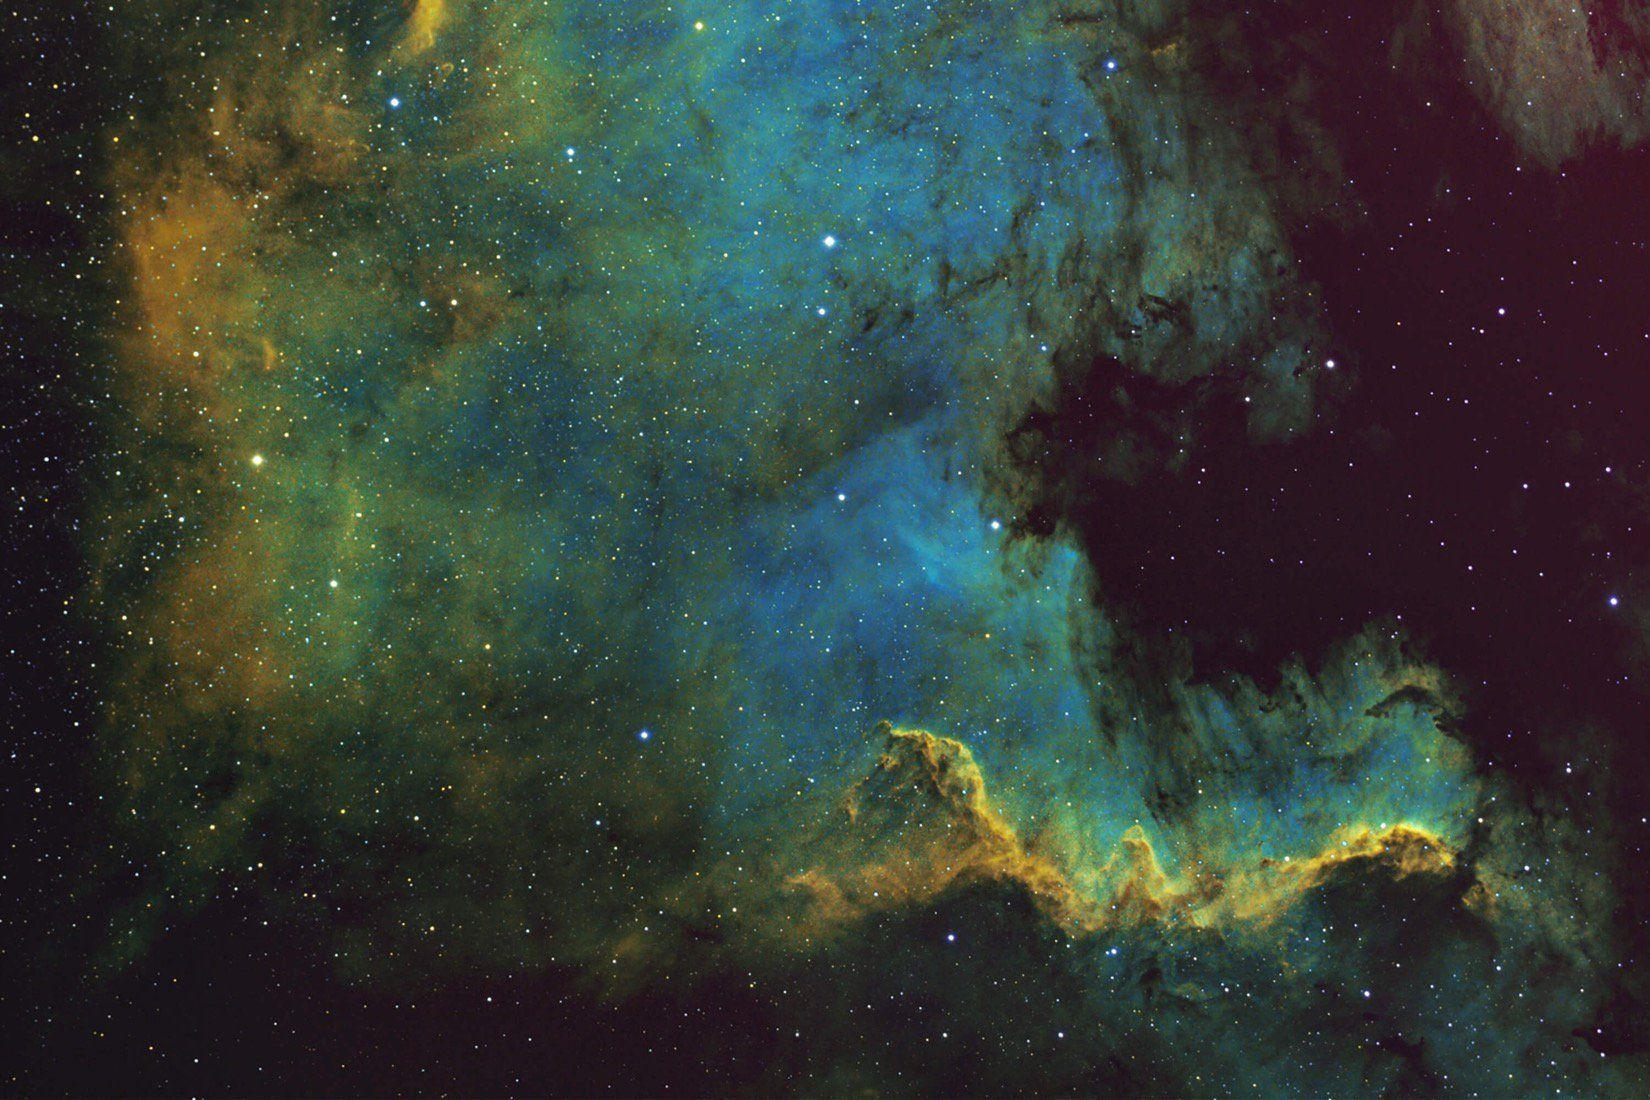 Yellow Galaxy Wallpaper Space Theme Mural Muralswallpaper Blue Galaxy Wallpaper Galaxy Wallpaper Mural